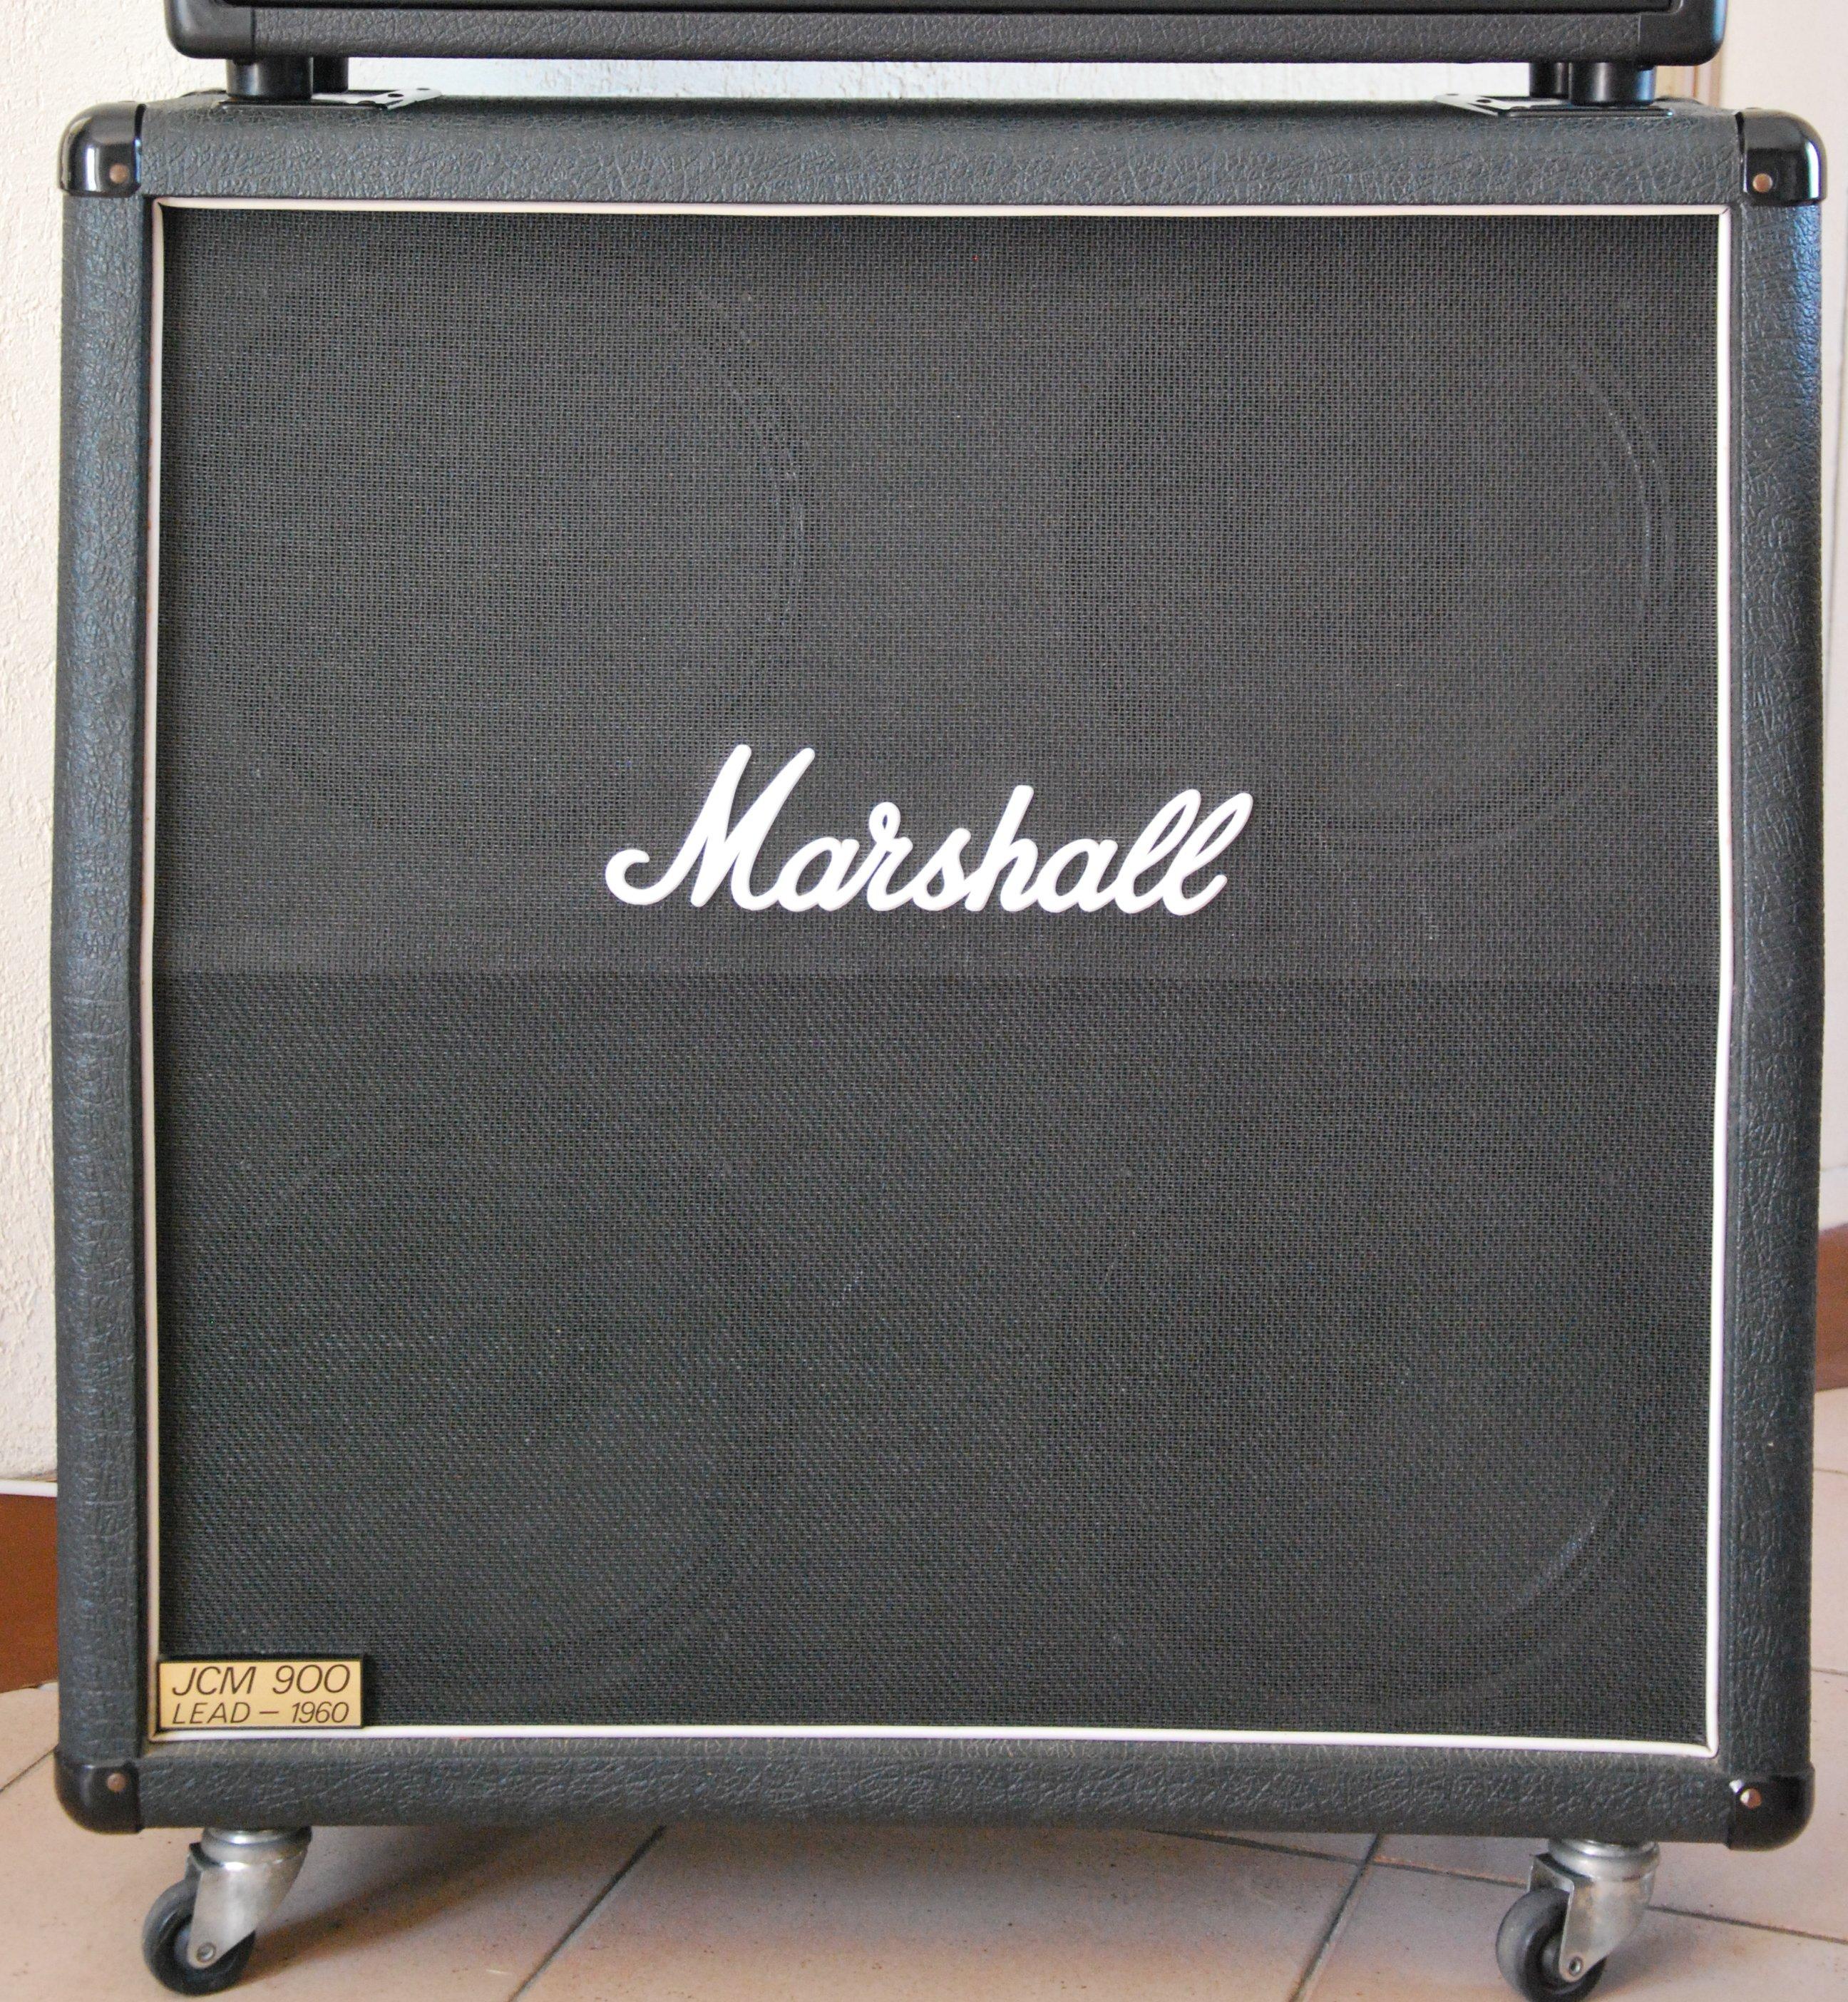 marshall 1960a jcm800 lead image 232507 audiofanzine. Black Bedroom Furniture Sets. Home Design Ideas